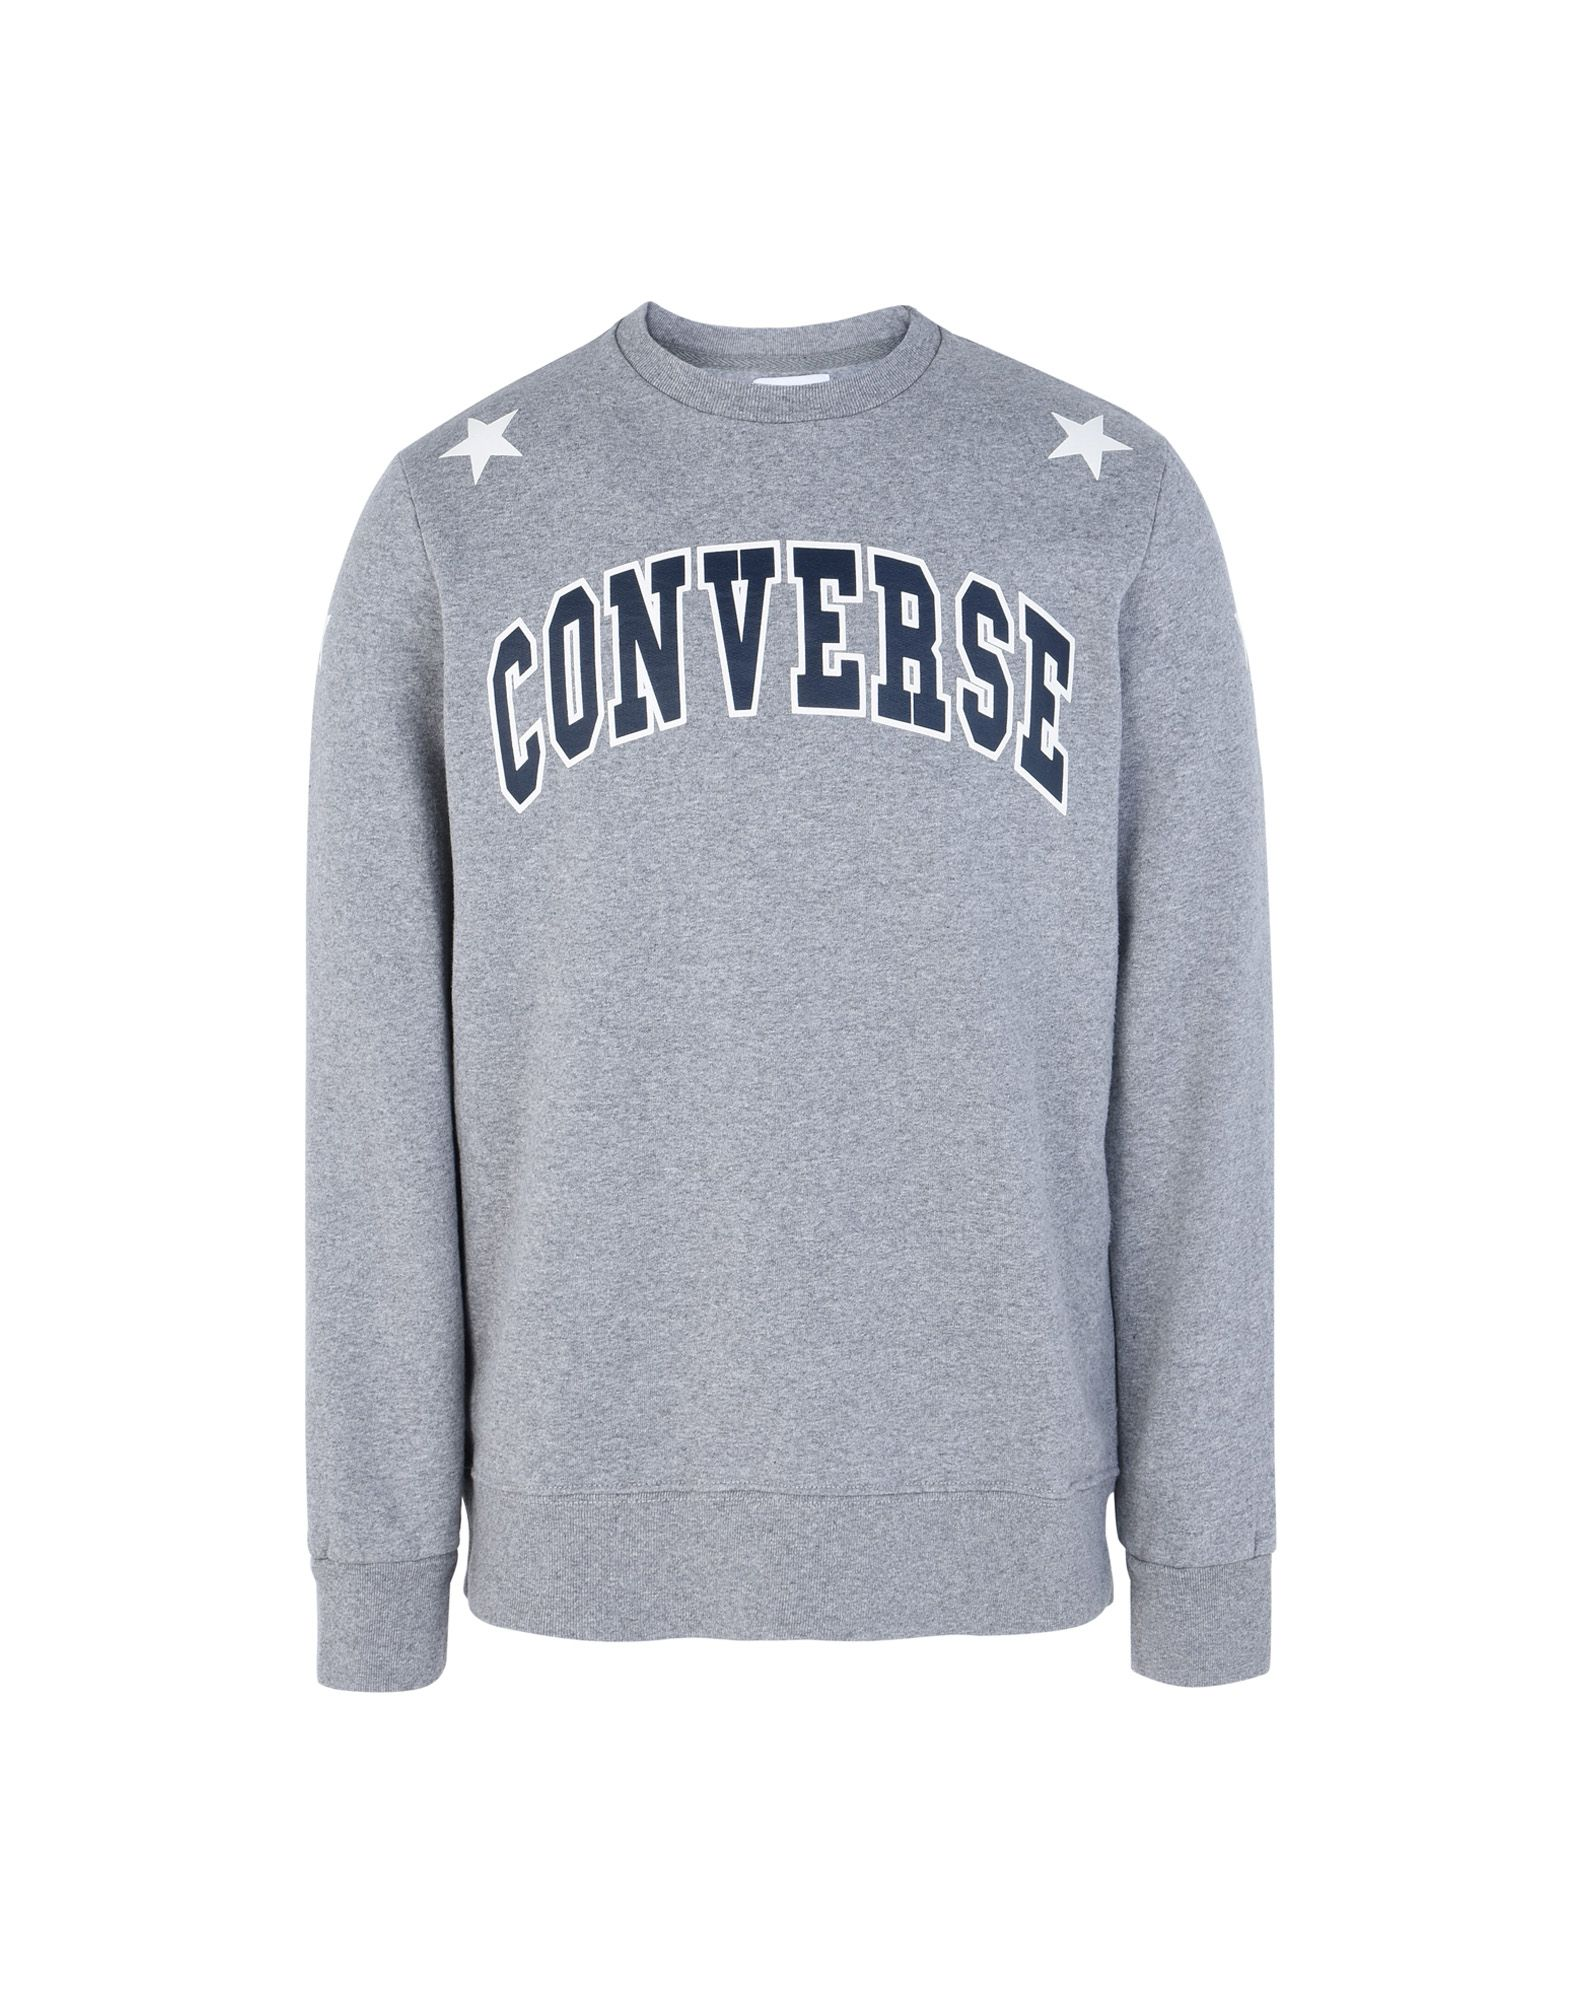 CONVERSE ALL STAR Herren Sweatshirt Farbe Grau Größe 4